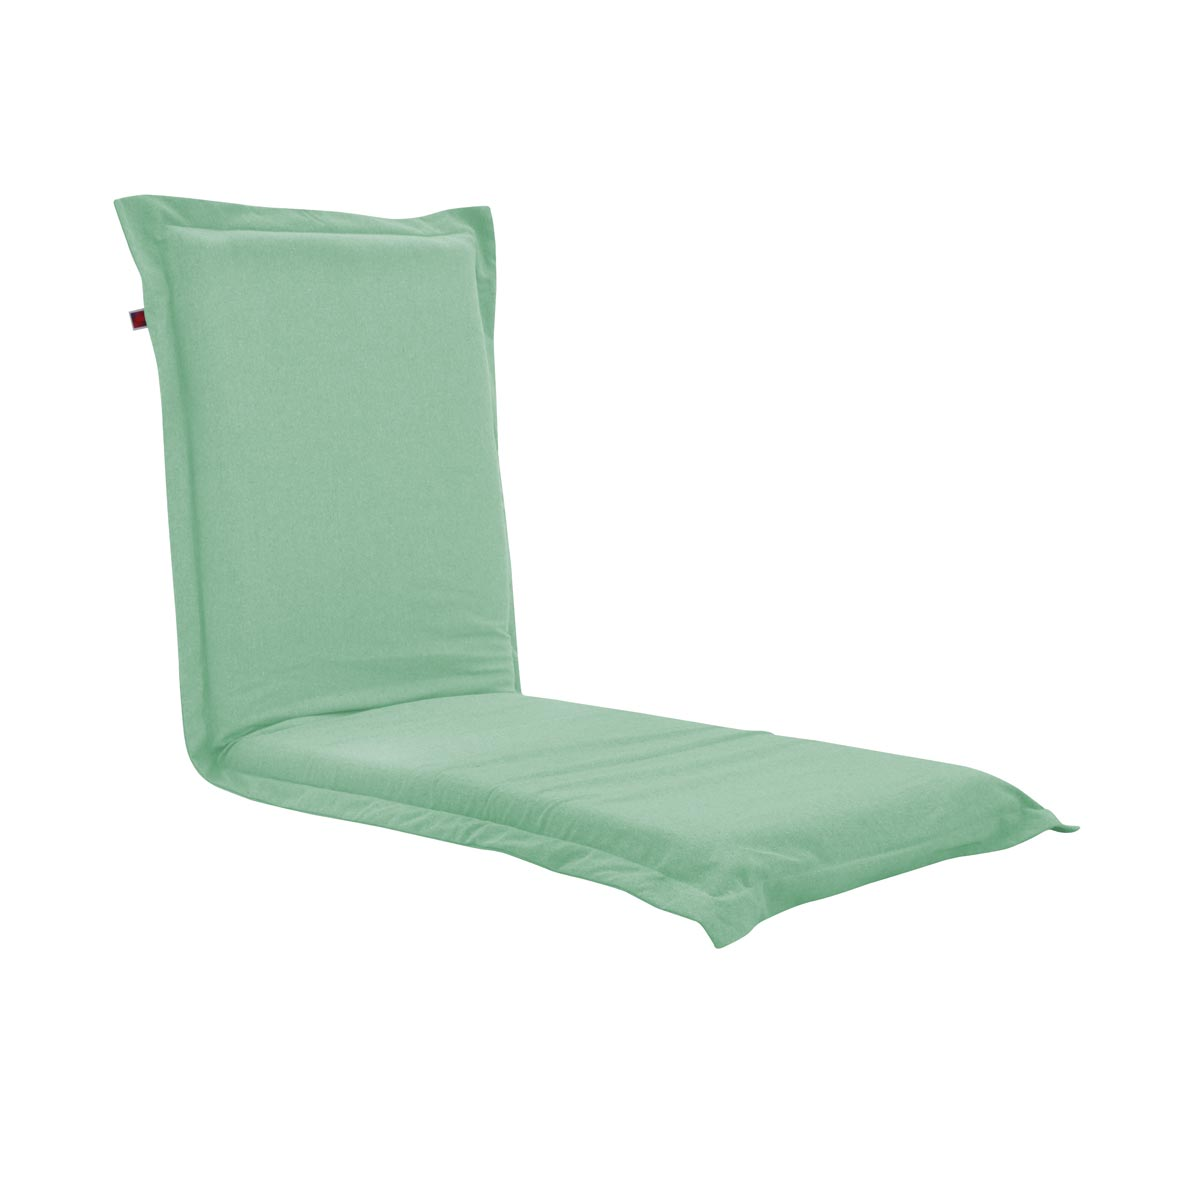 Pufe ClicClac Uno Lounge Tecido Ecolona Verde Menta 02 03a